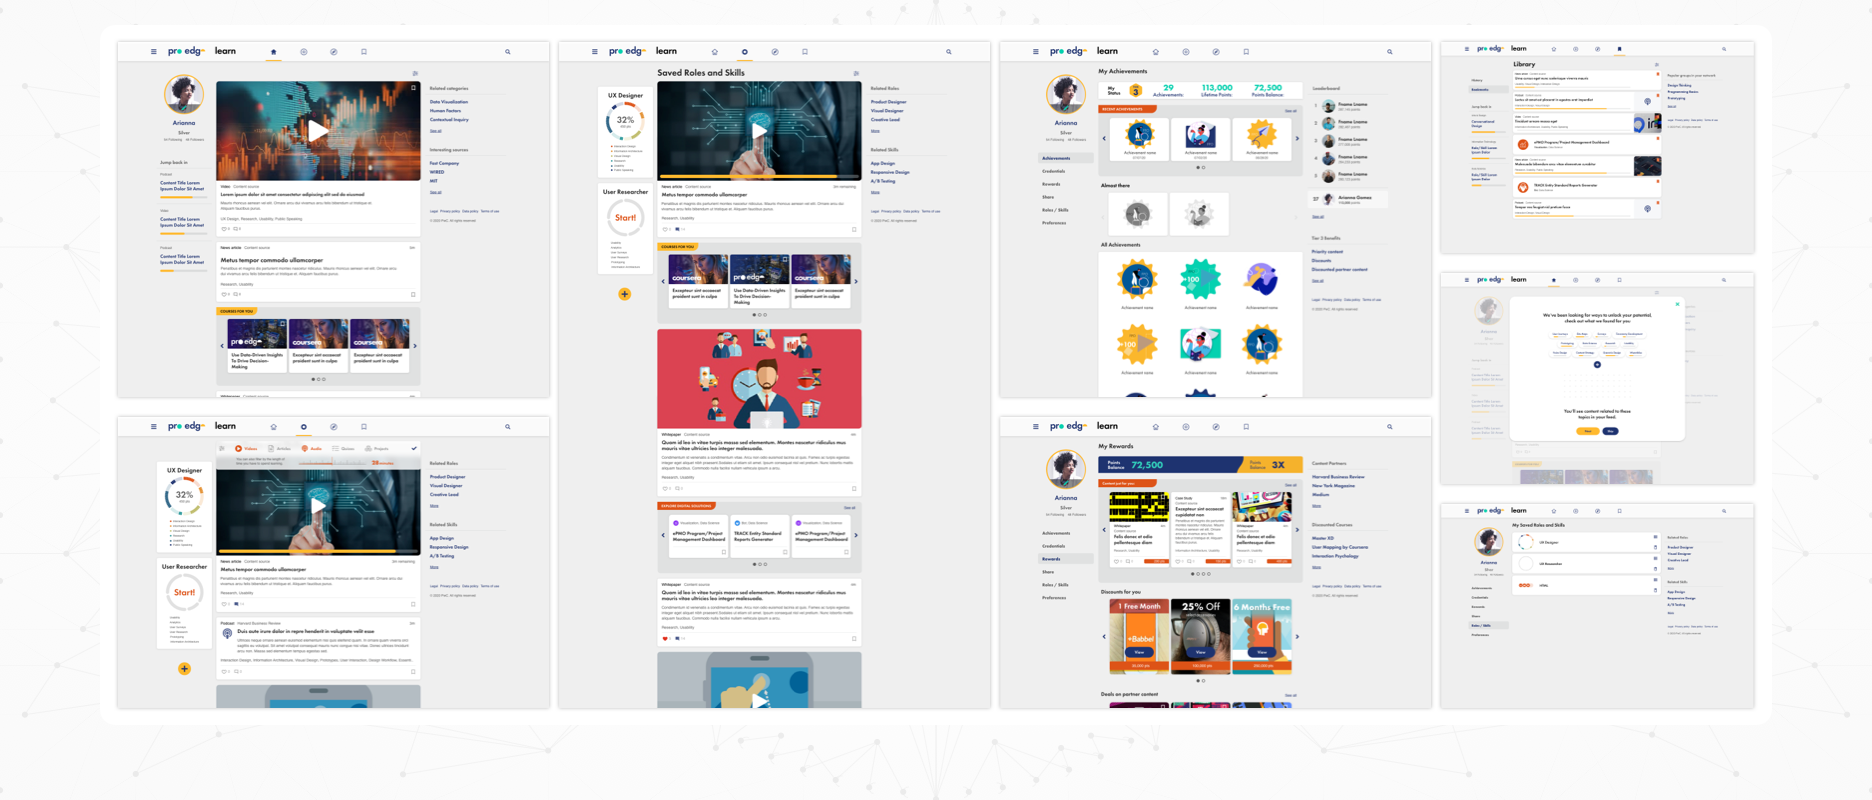 PWC - Case Study Image - Web Designs